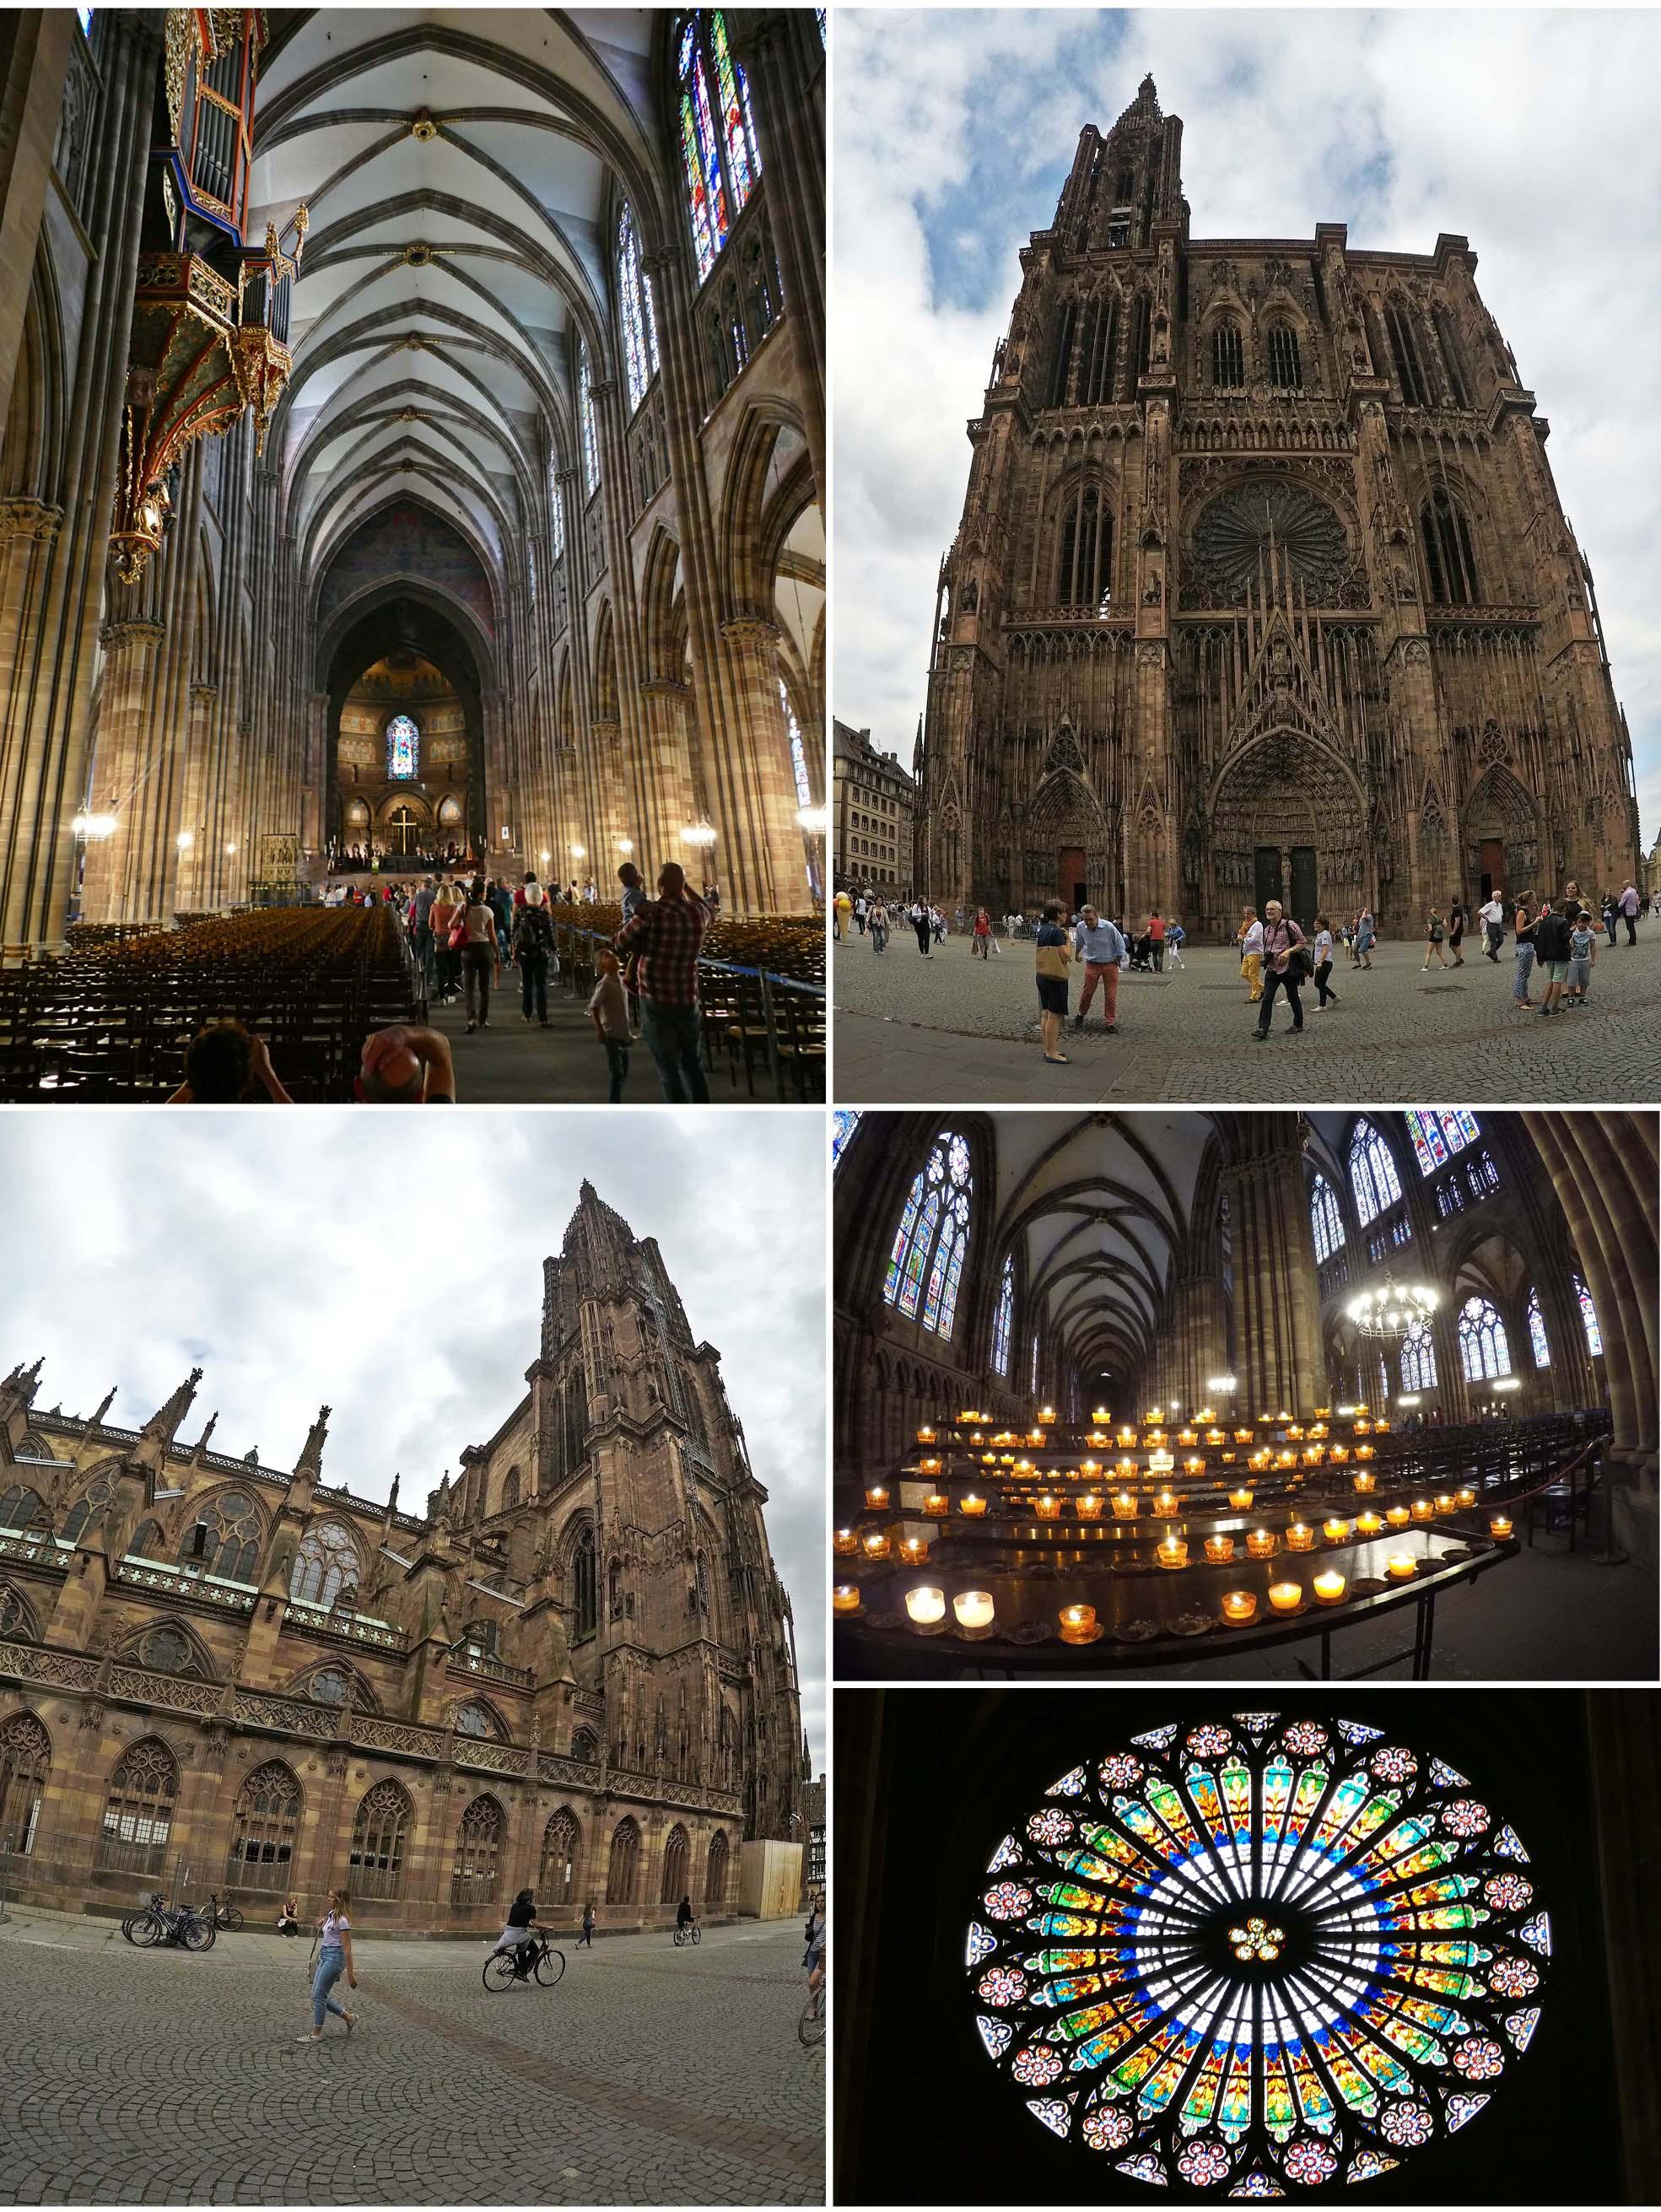 europe, France, road trip, voyage, ville, Strasbourg, cathédrale, bougie, vitraux, église, place, rue